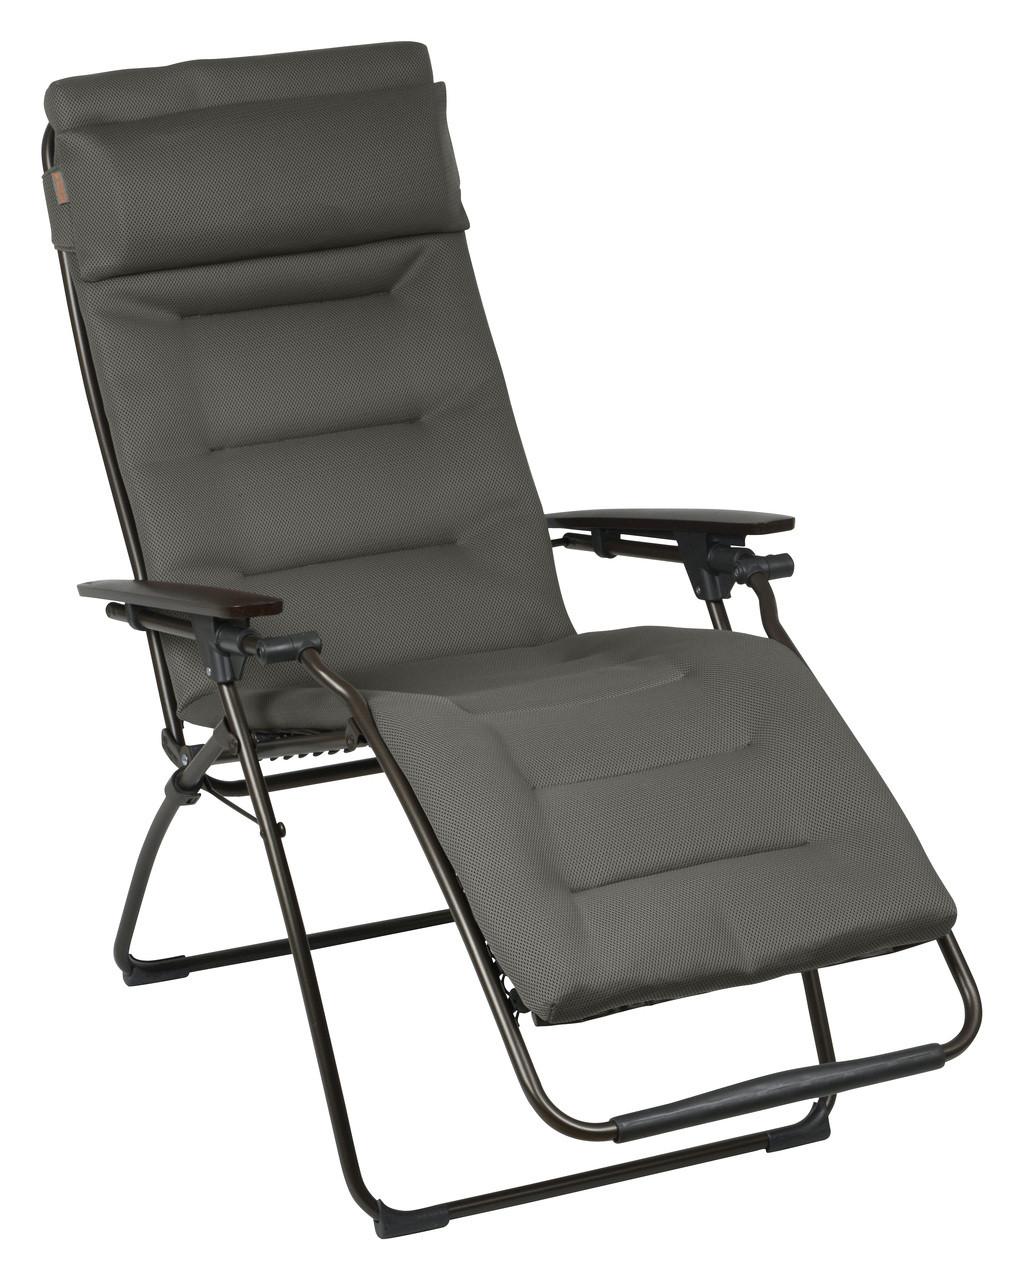 Anti gravity chair camp - Lafuma Futura Air Comfort Taupe Padded Zero Gravity Recliner